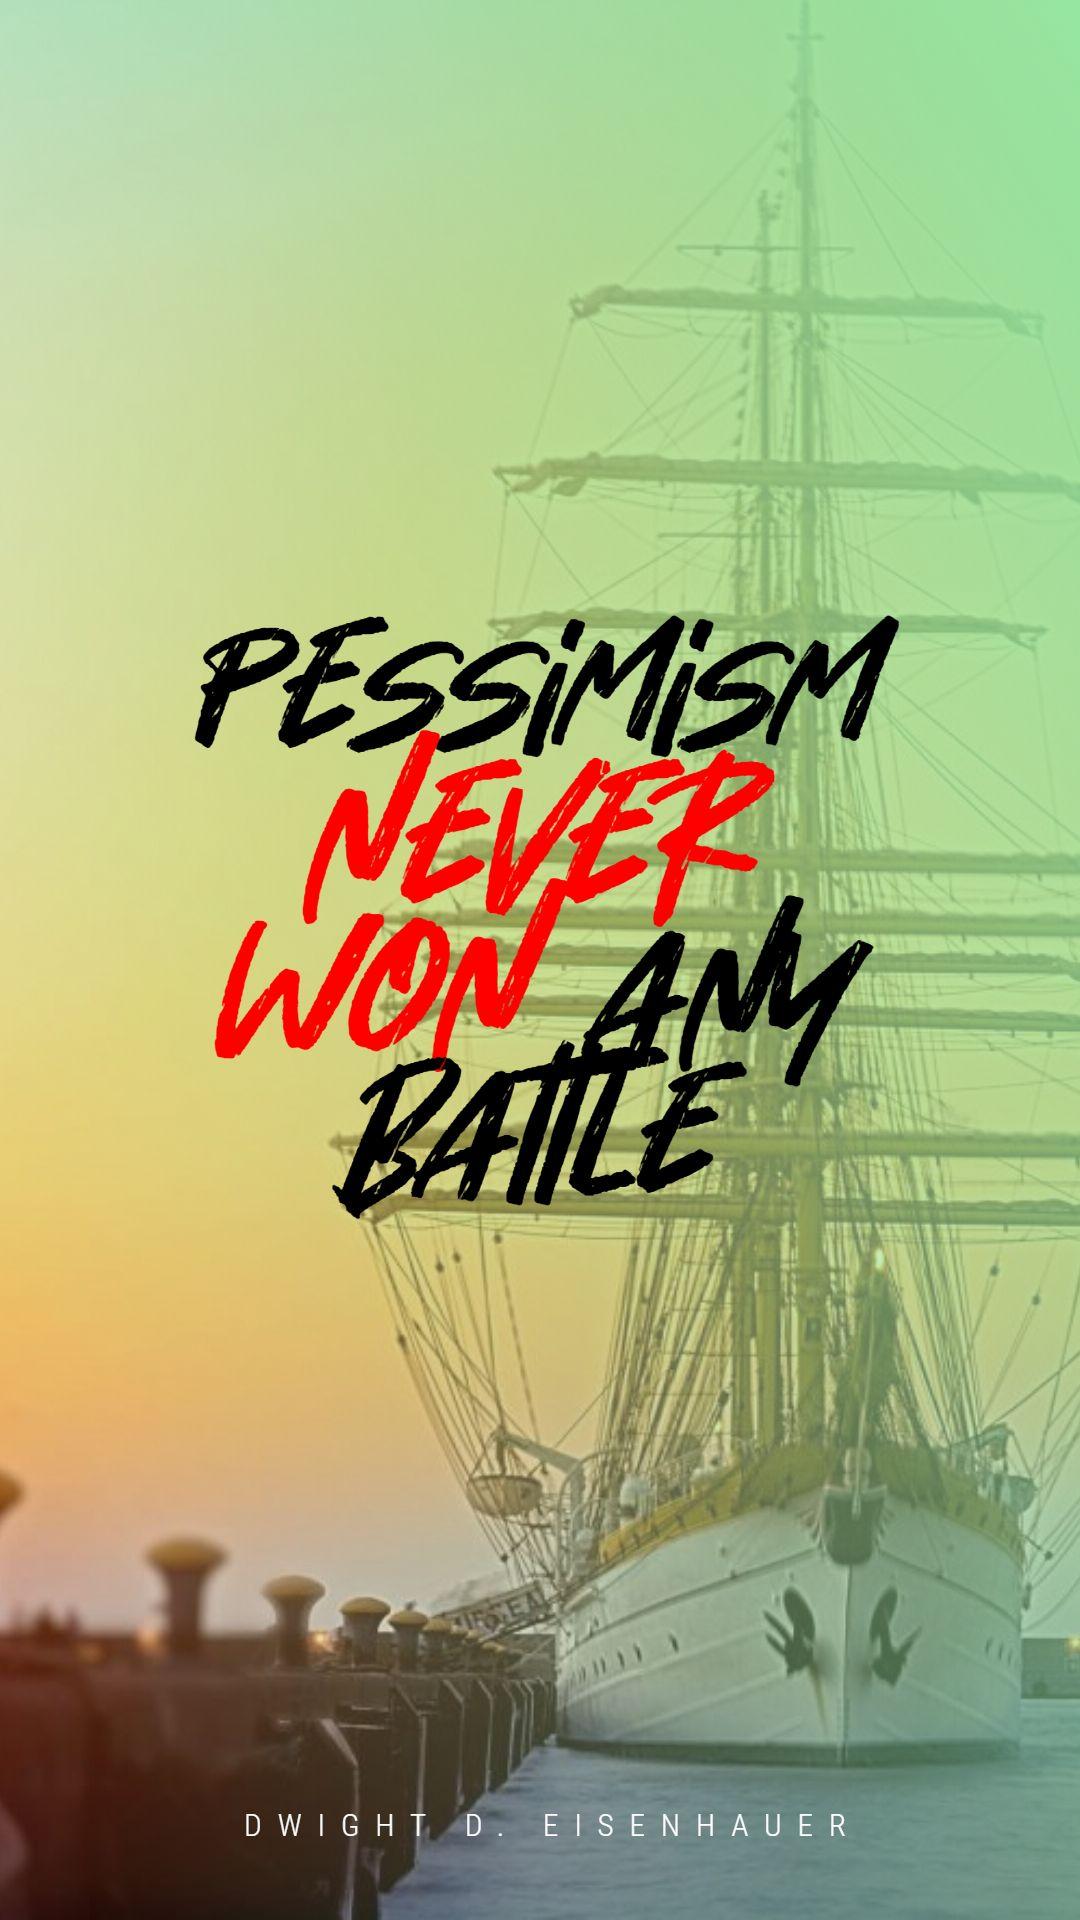 Quotes image of Pessimism never won any battle